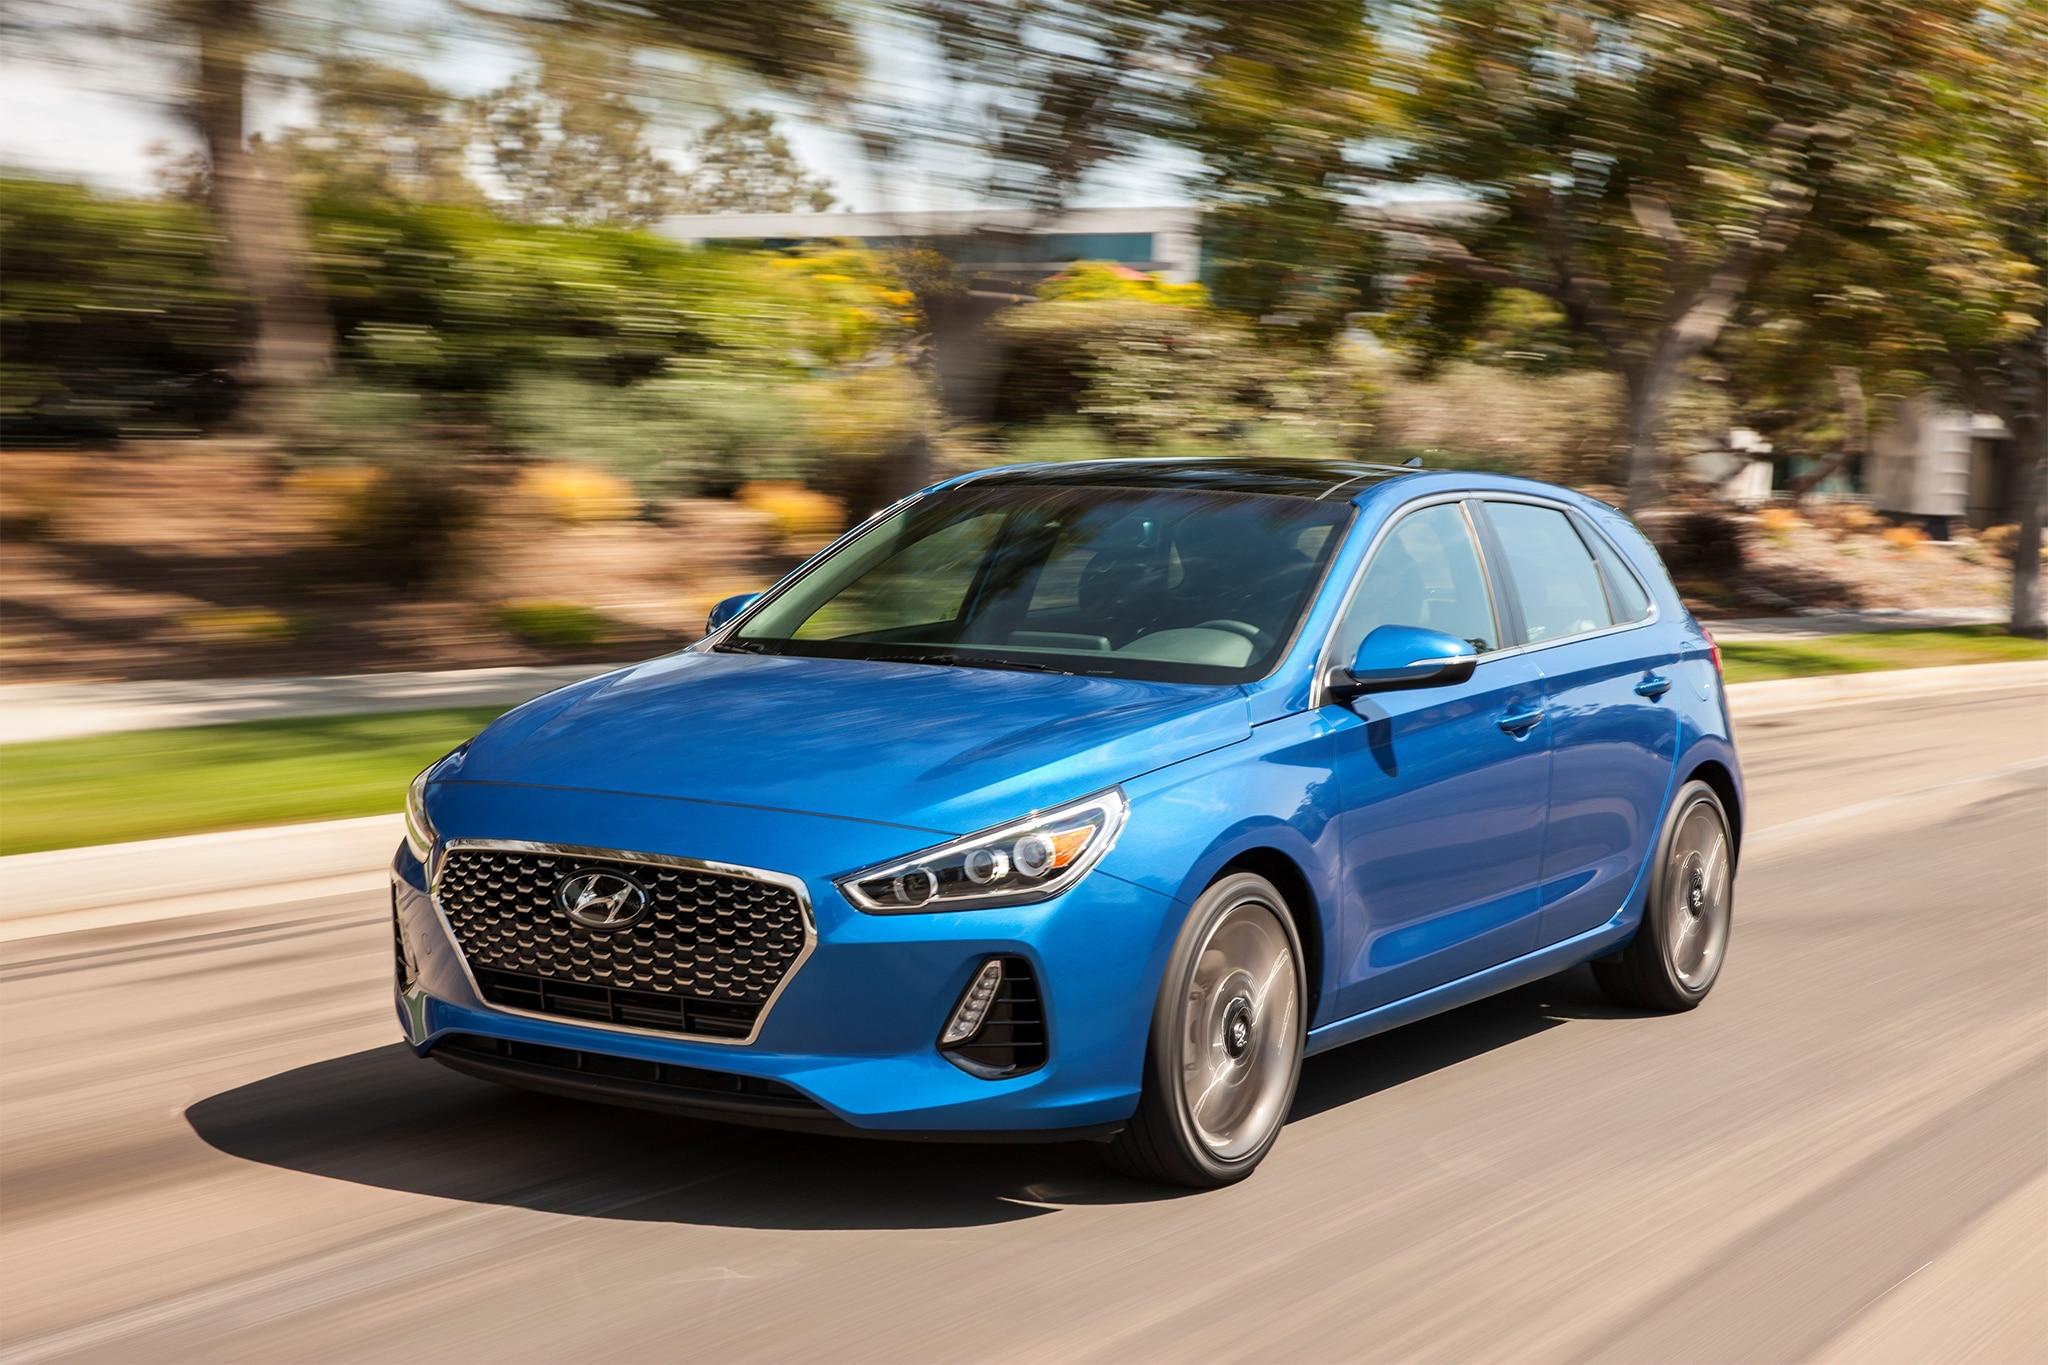 2018 Hyundai Elantra Gt Sport First Drive Review